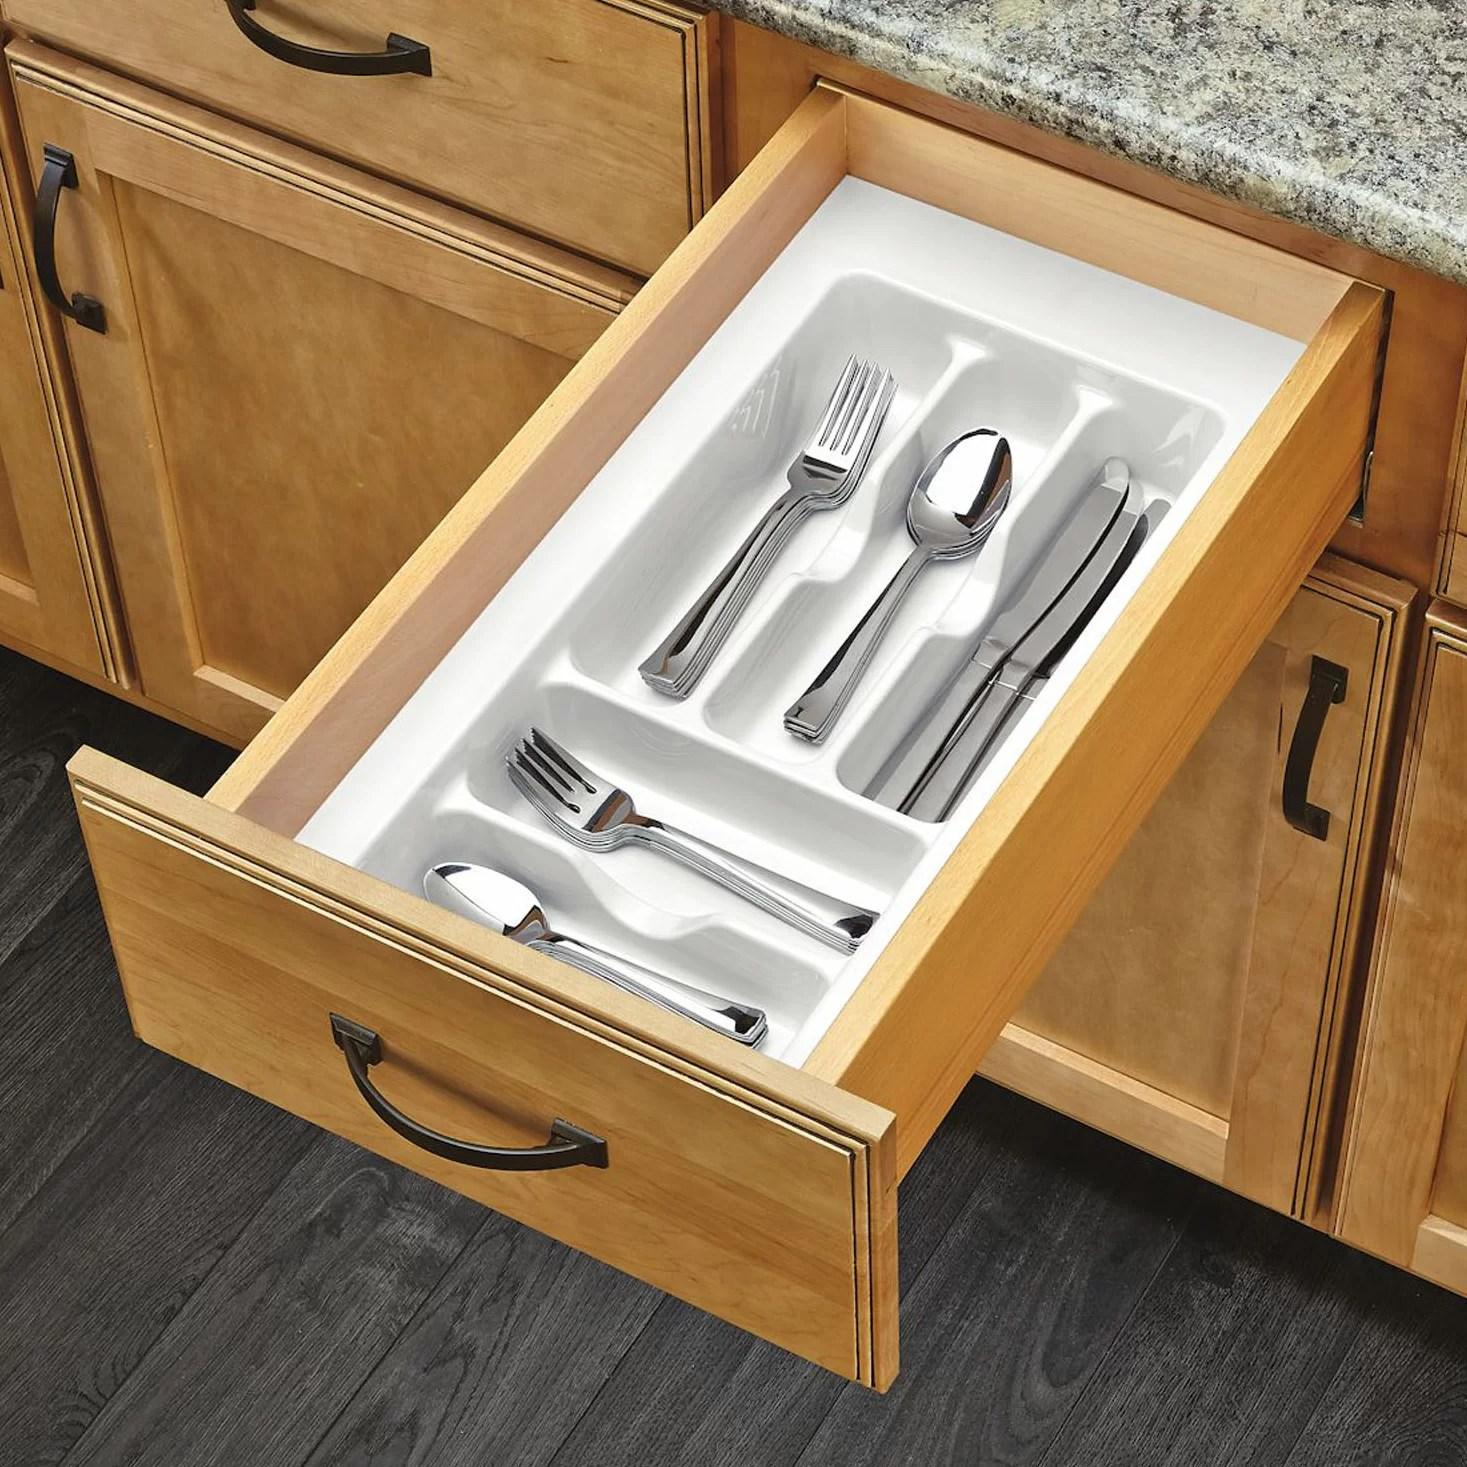 Rev A Shelf Small Cutlery Drawer Organizer Reviews Wayfair